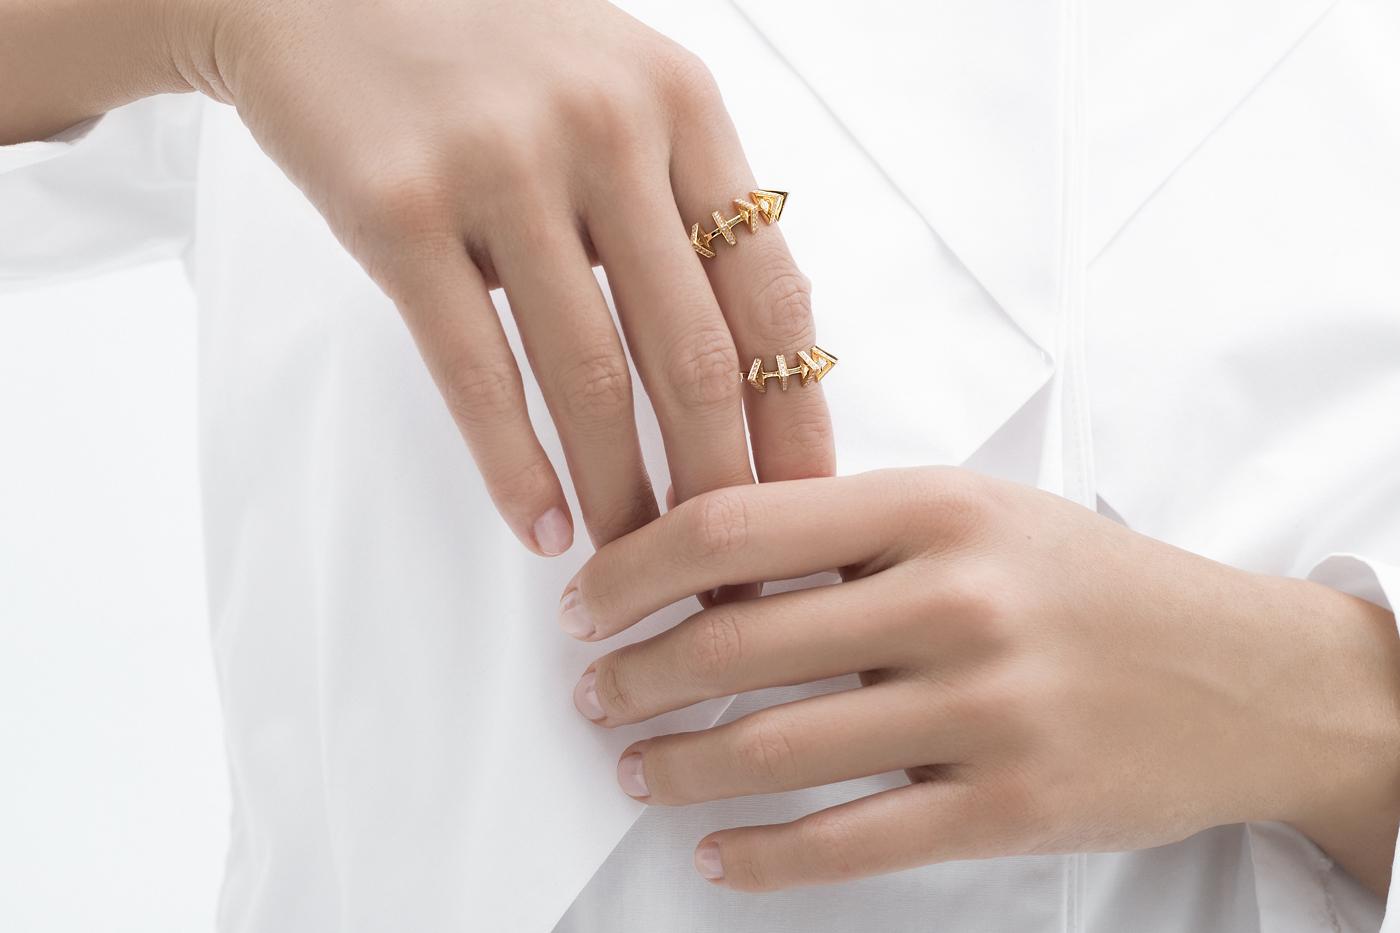 karlaticas_jewelry0006.jpg